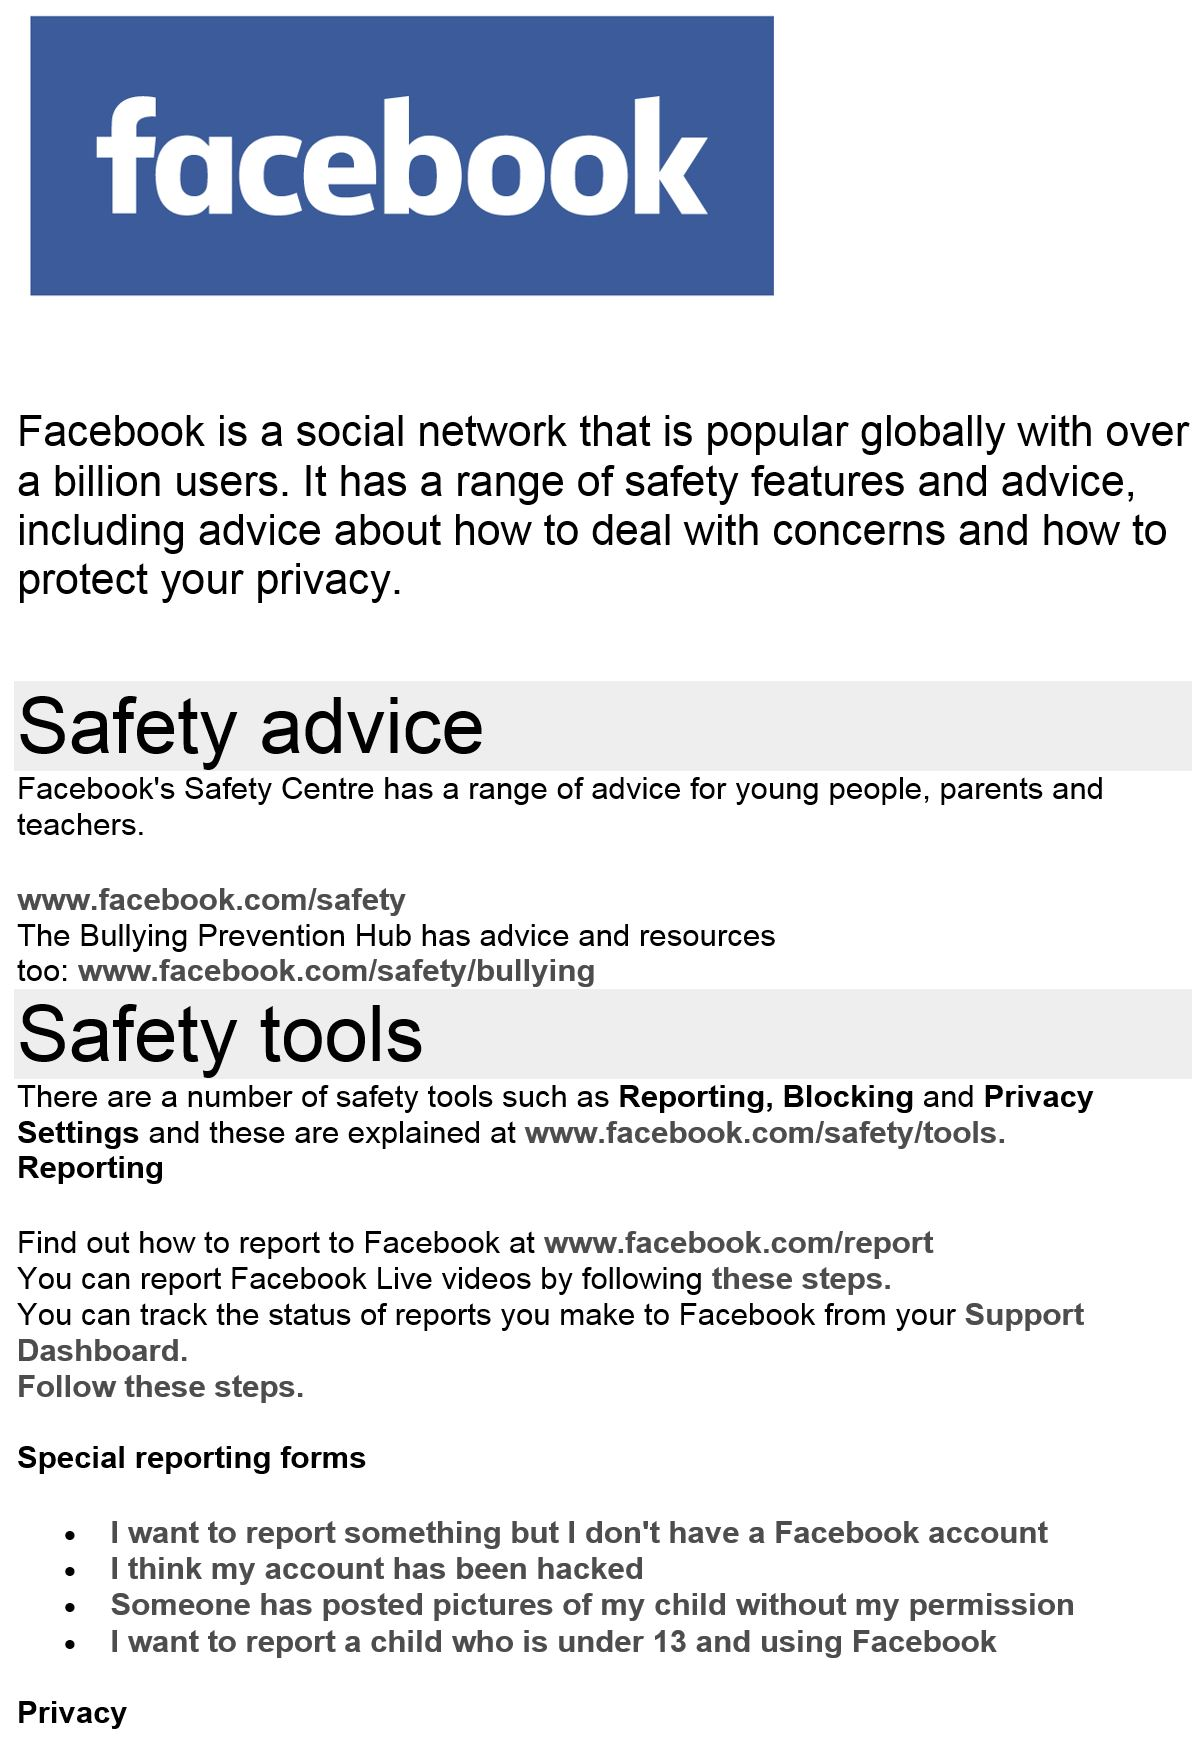 facebook safety 1